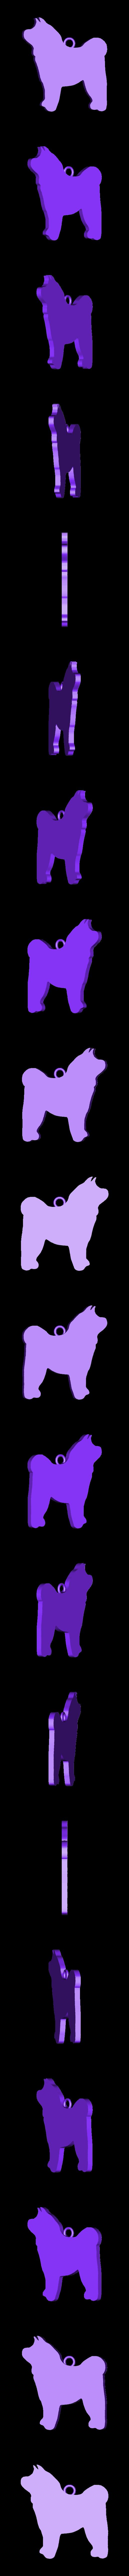 31.stl Download STL file Dogs • 3D printing object, GENNADI3313